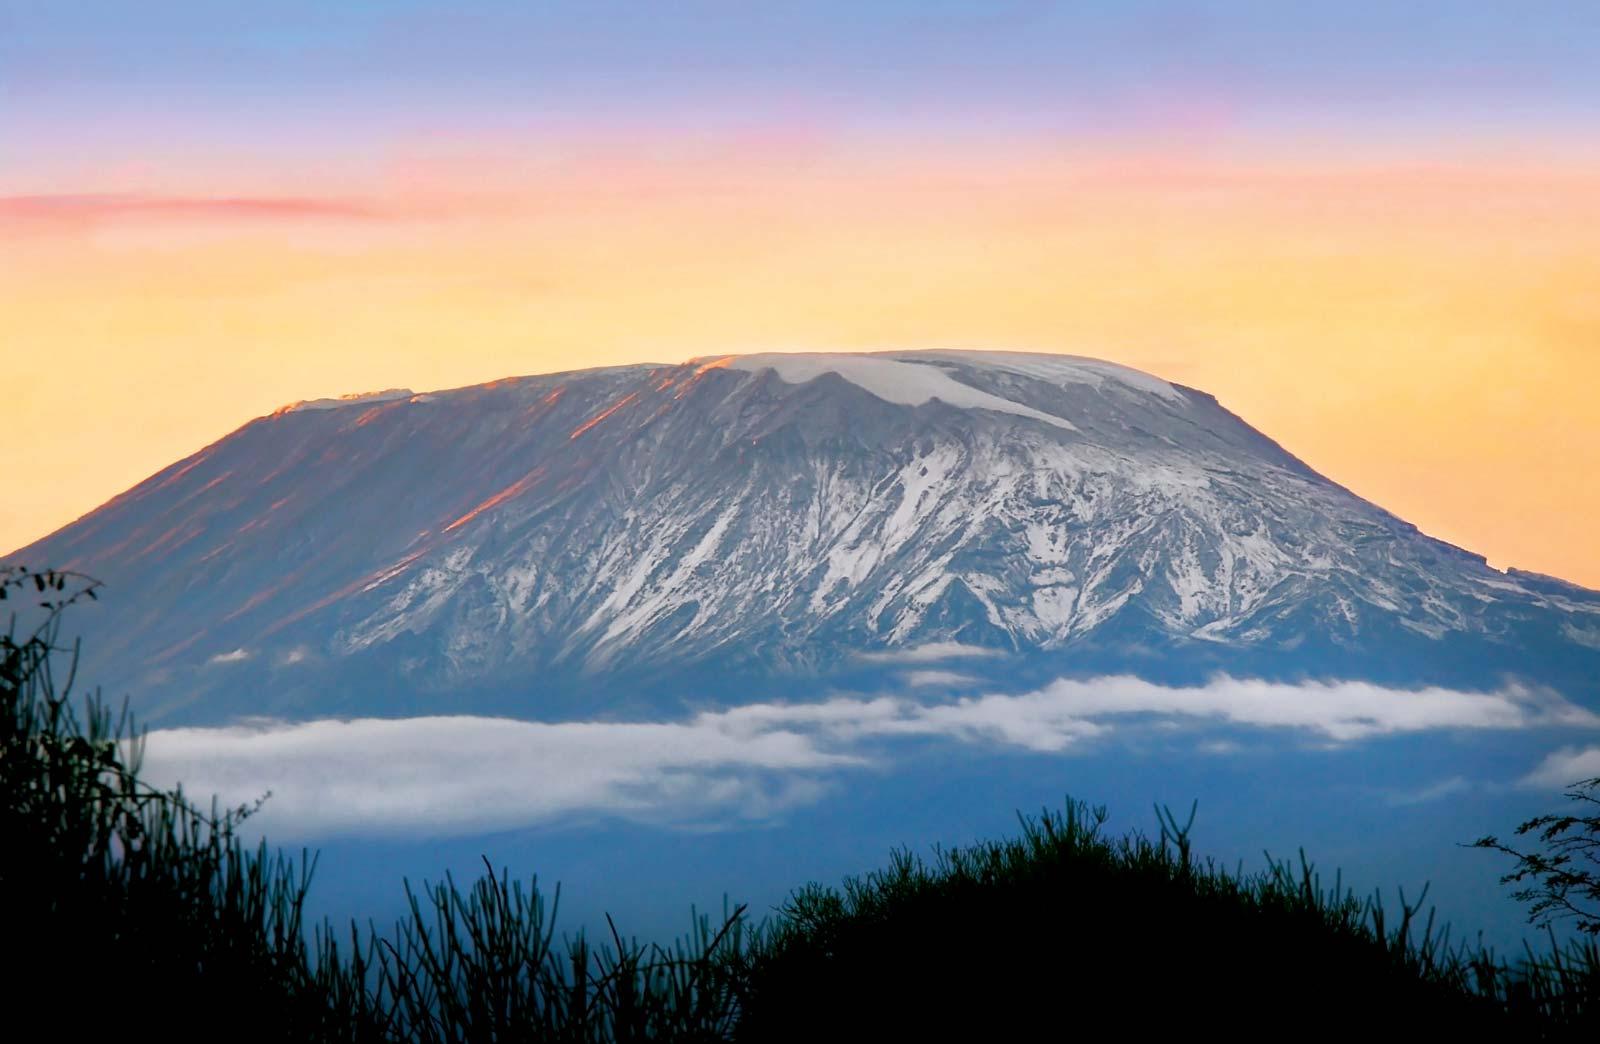 About Mount Kilimanjaro